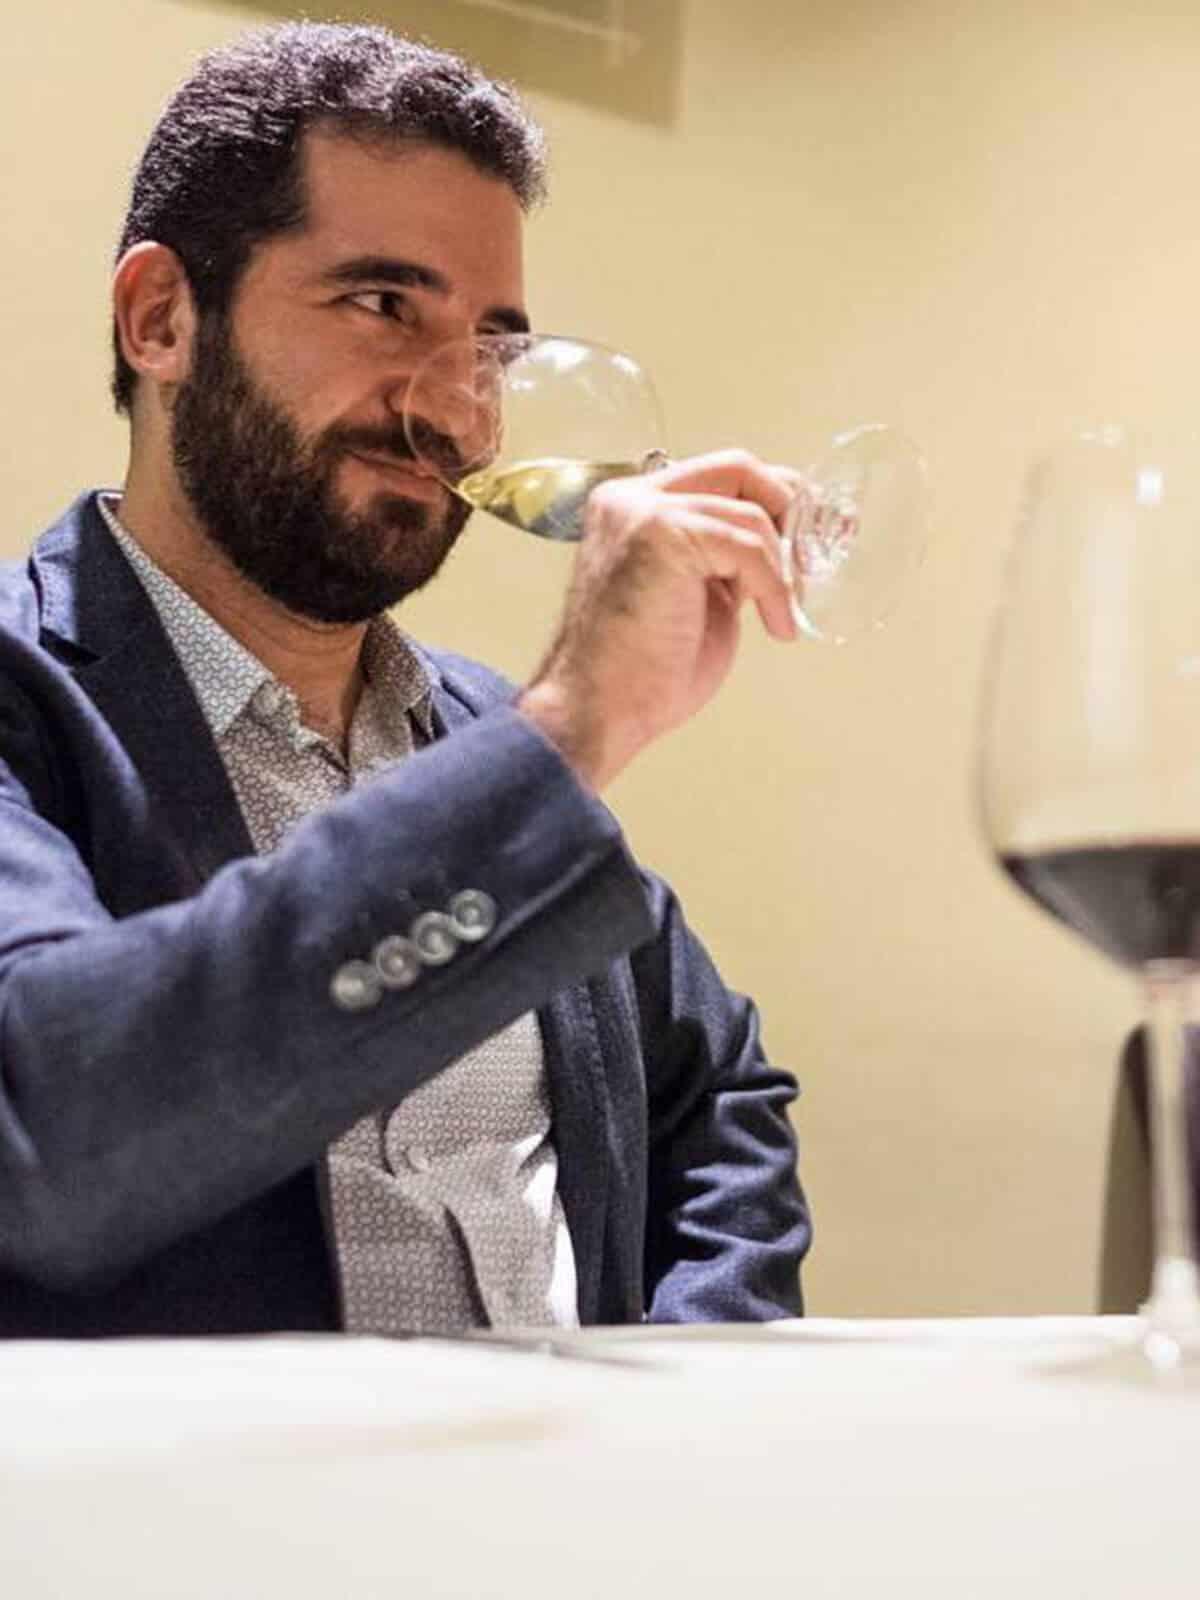 ramon barreiro wine tasting